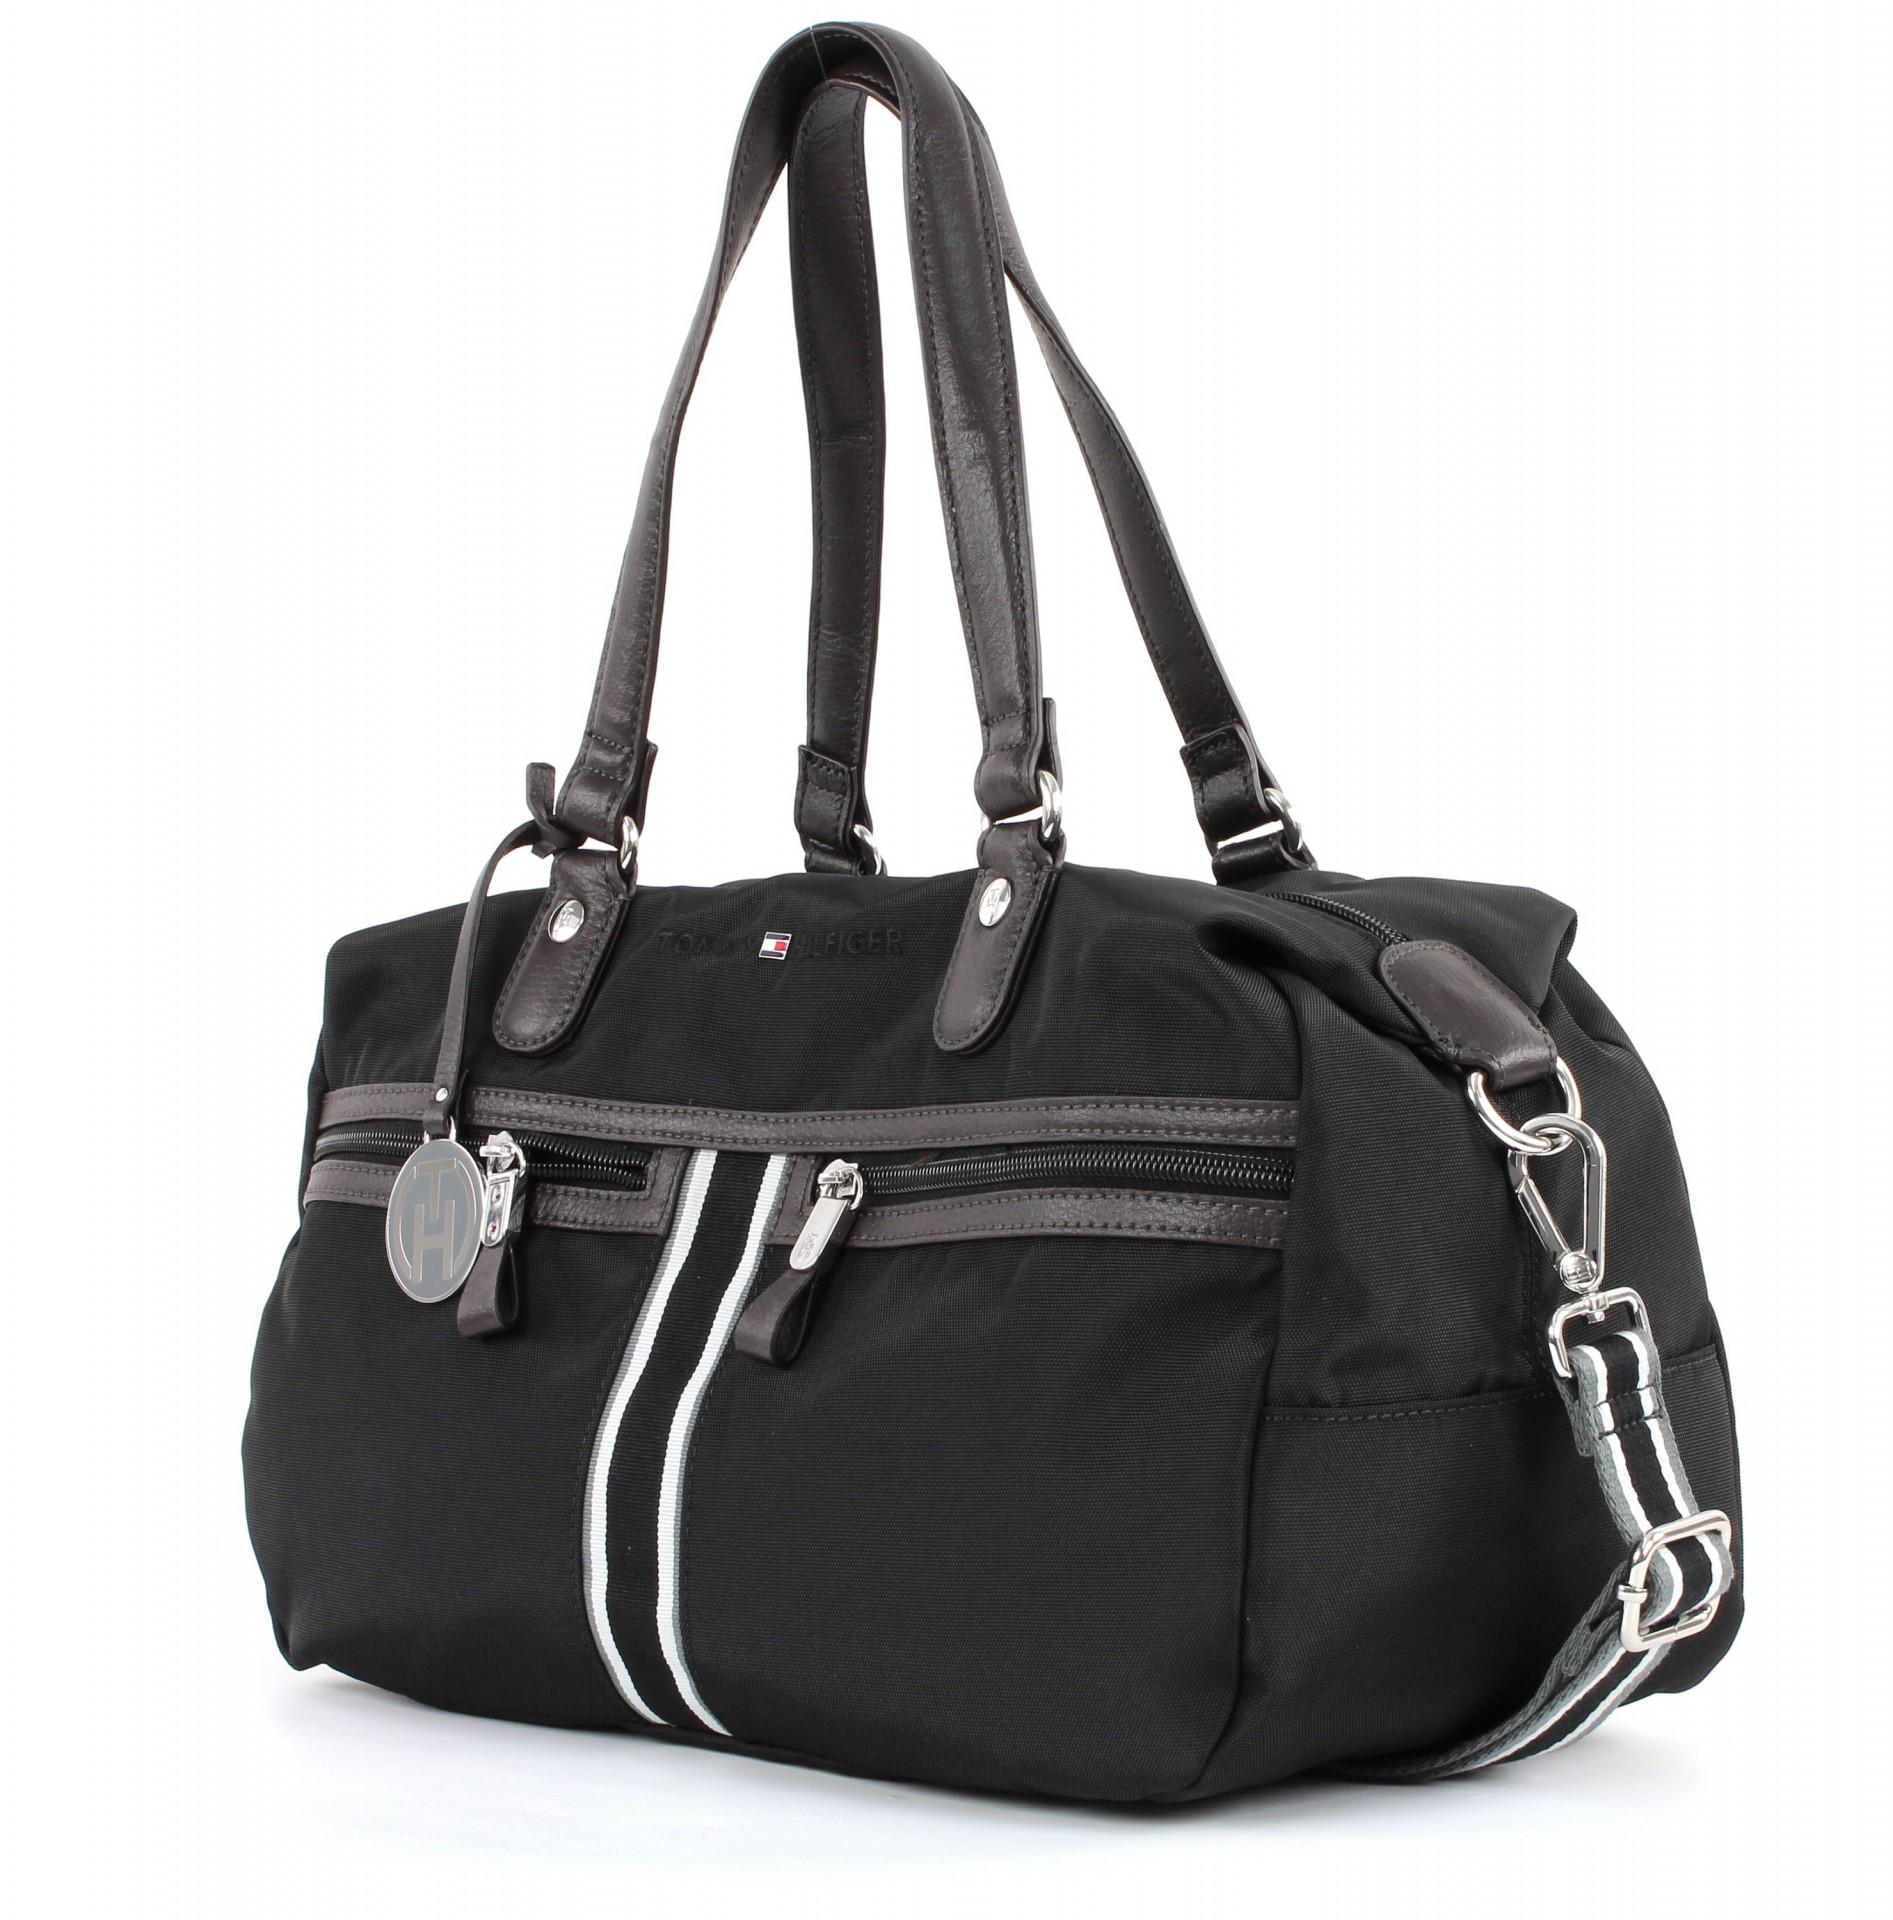 tommy hilfiger petra duffle tasche handtasche. Black Bedroom Furniture Sets. Home Design Ideas